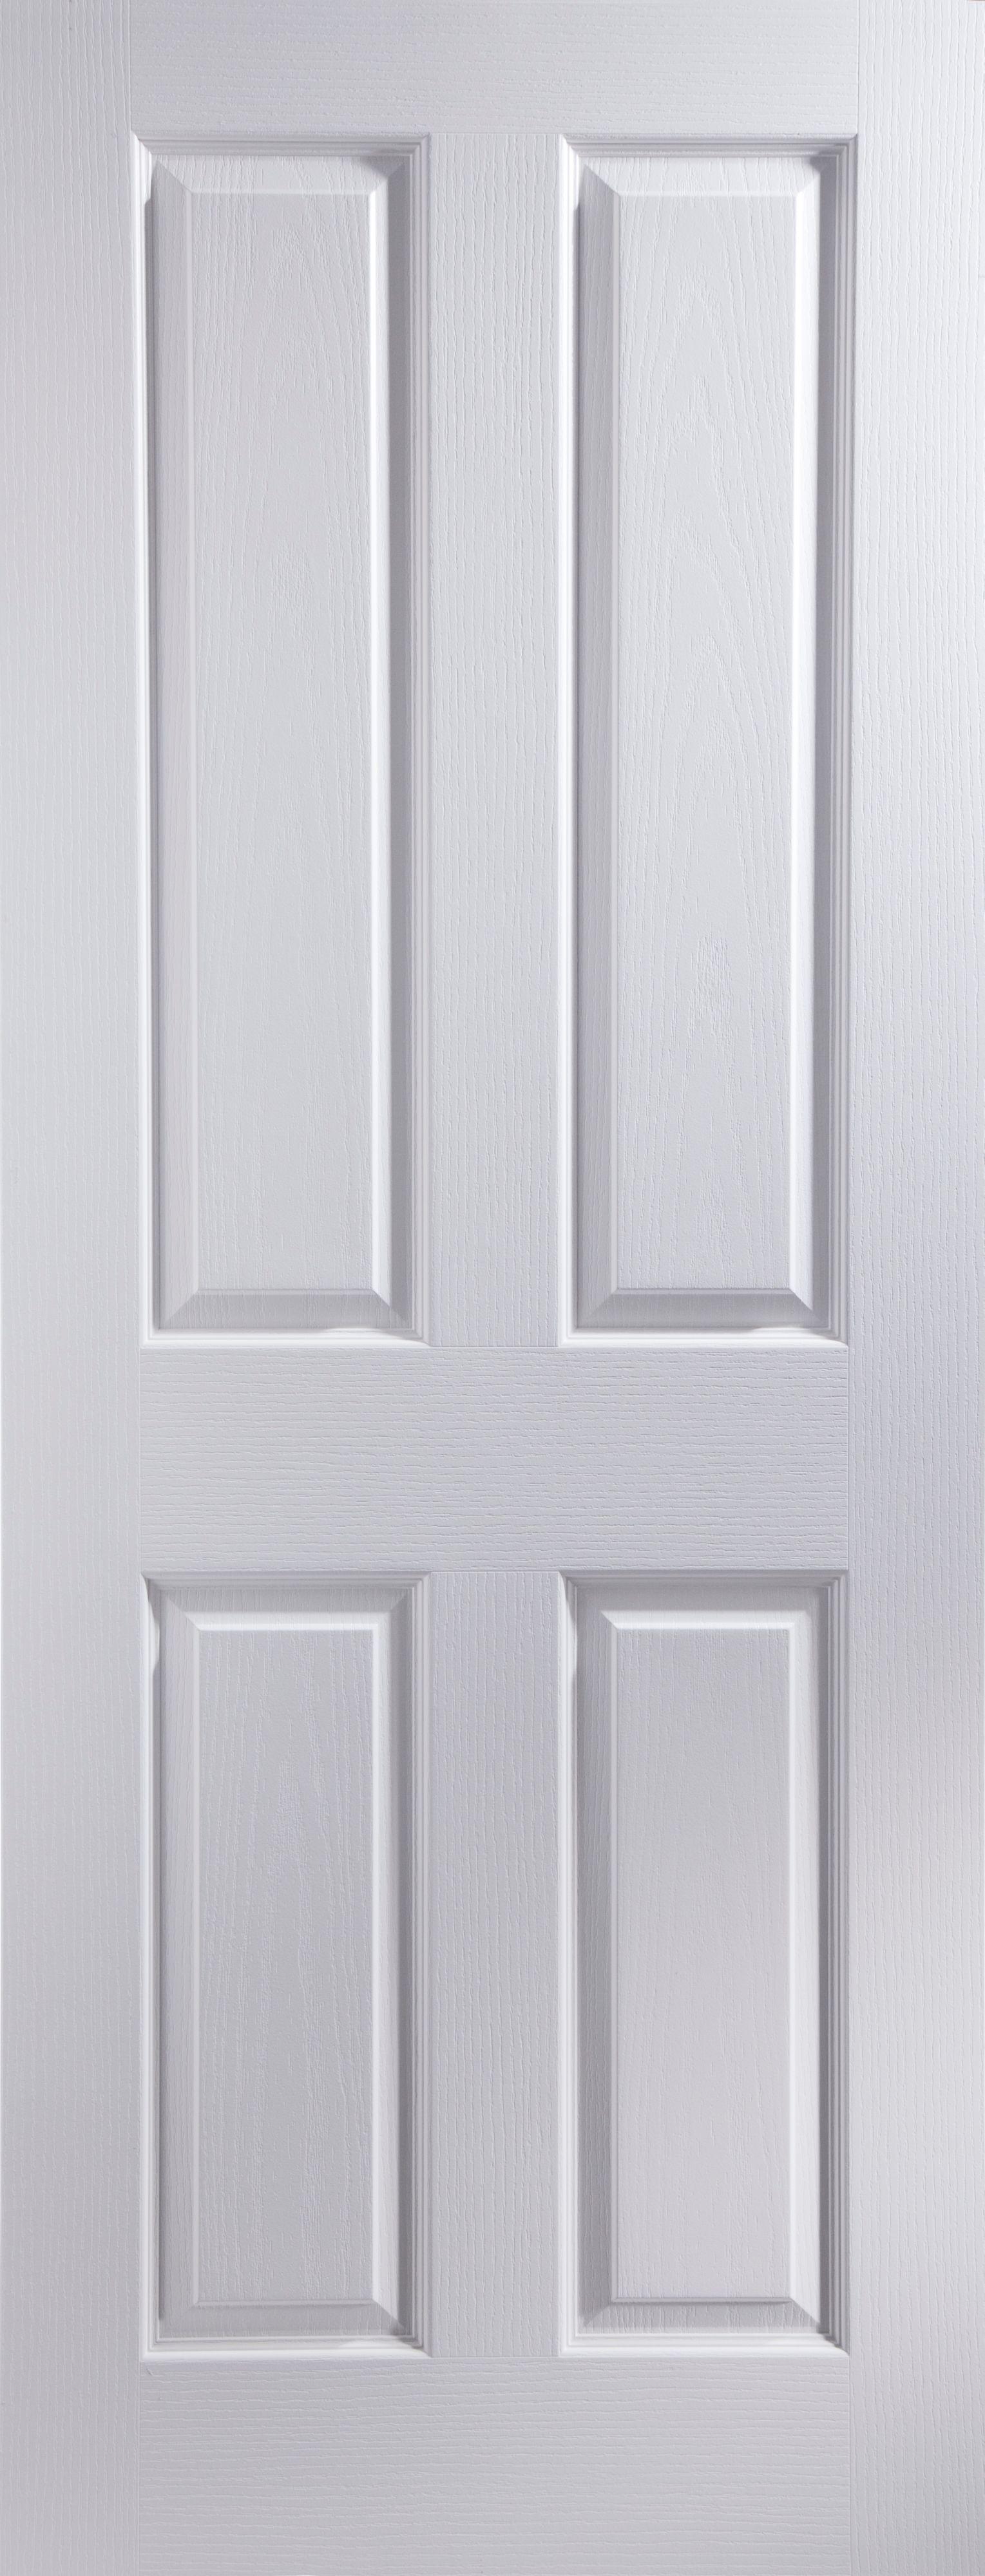 4 Panel Primed White Woodgrain Internal Door H1981mm W610mm Departments Diy At Bq